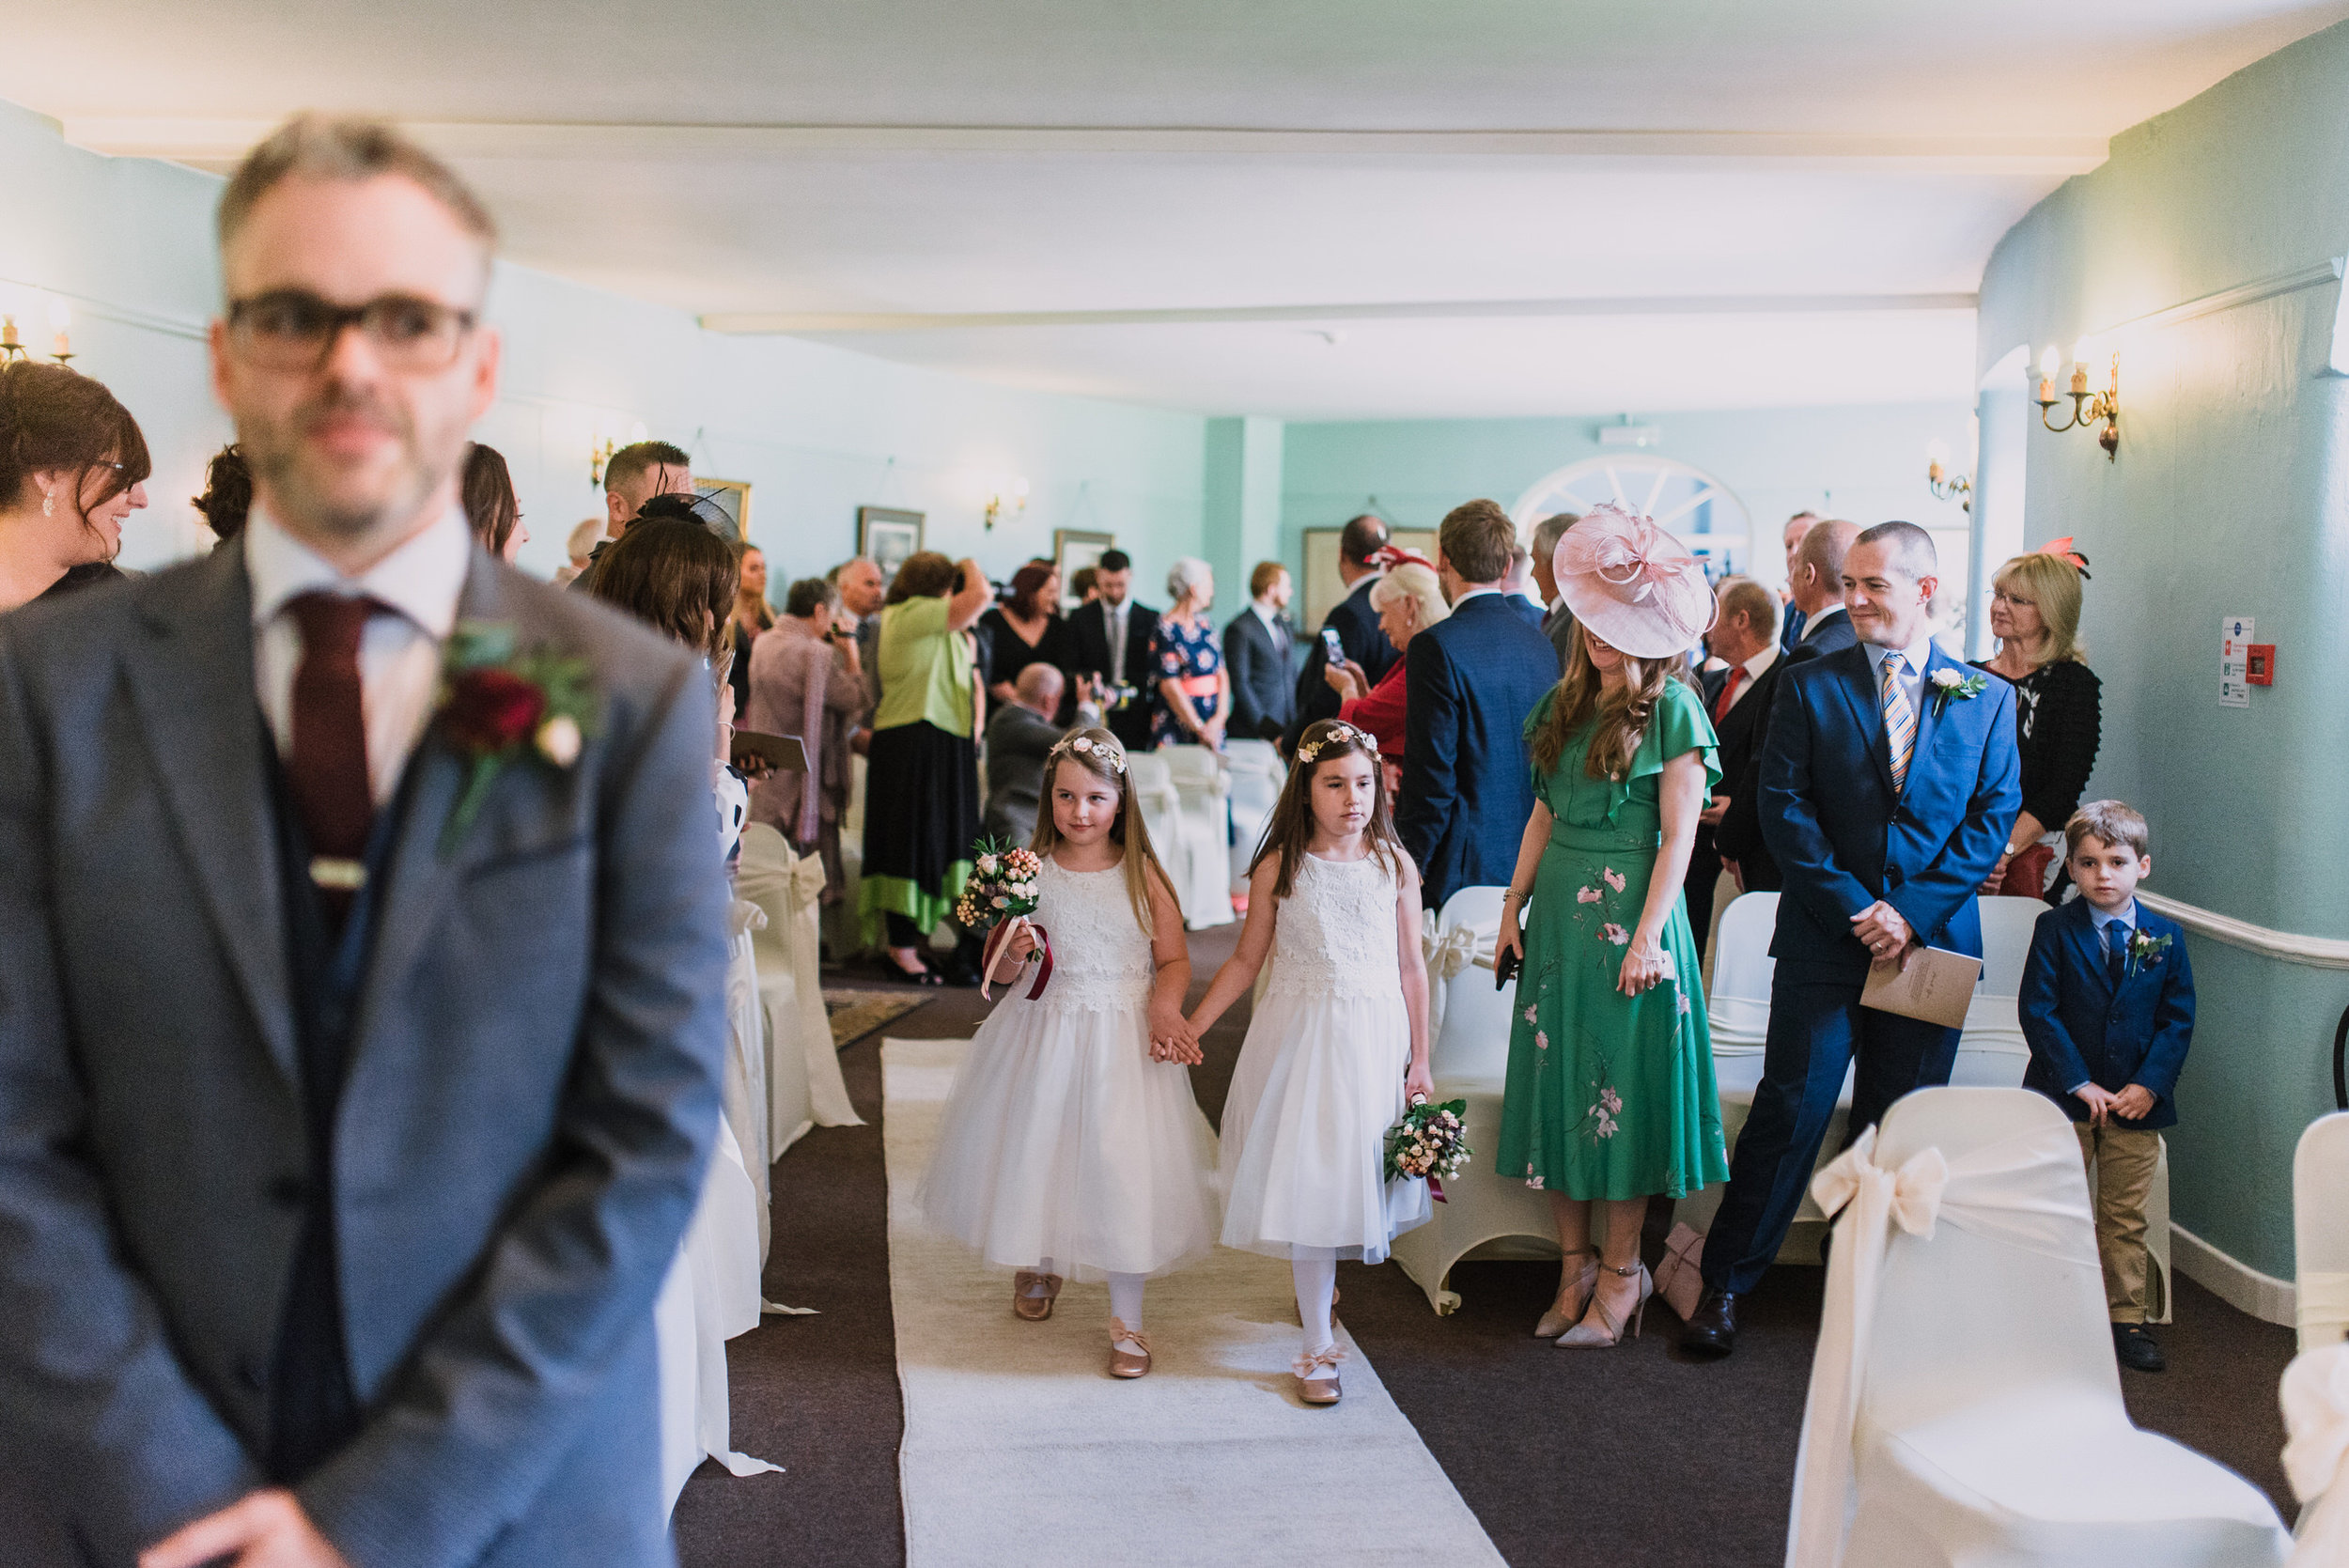 lissanoure castle wedding, northern ireland wedding photographer, romantic northern irish wedding venue, castle wedding ireland, natural wedding photography ni (43).jpg